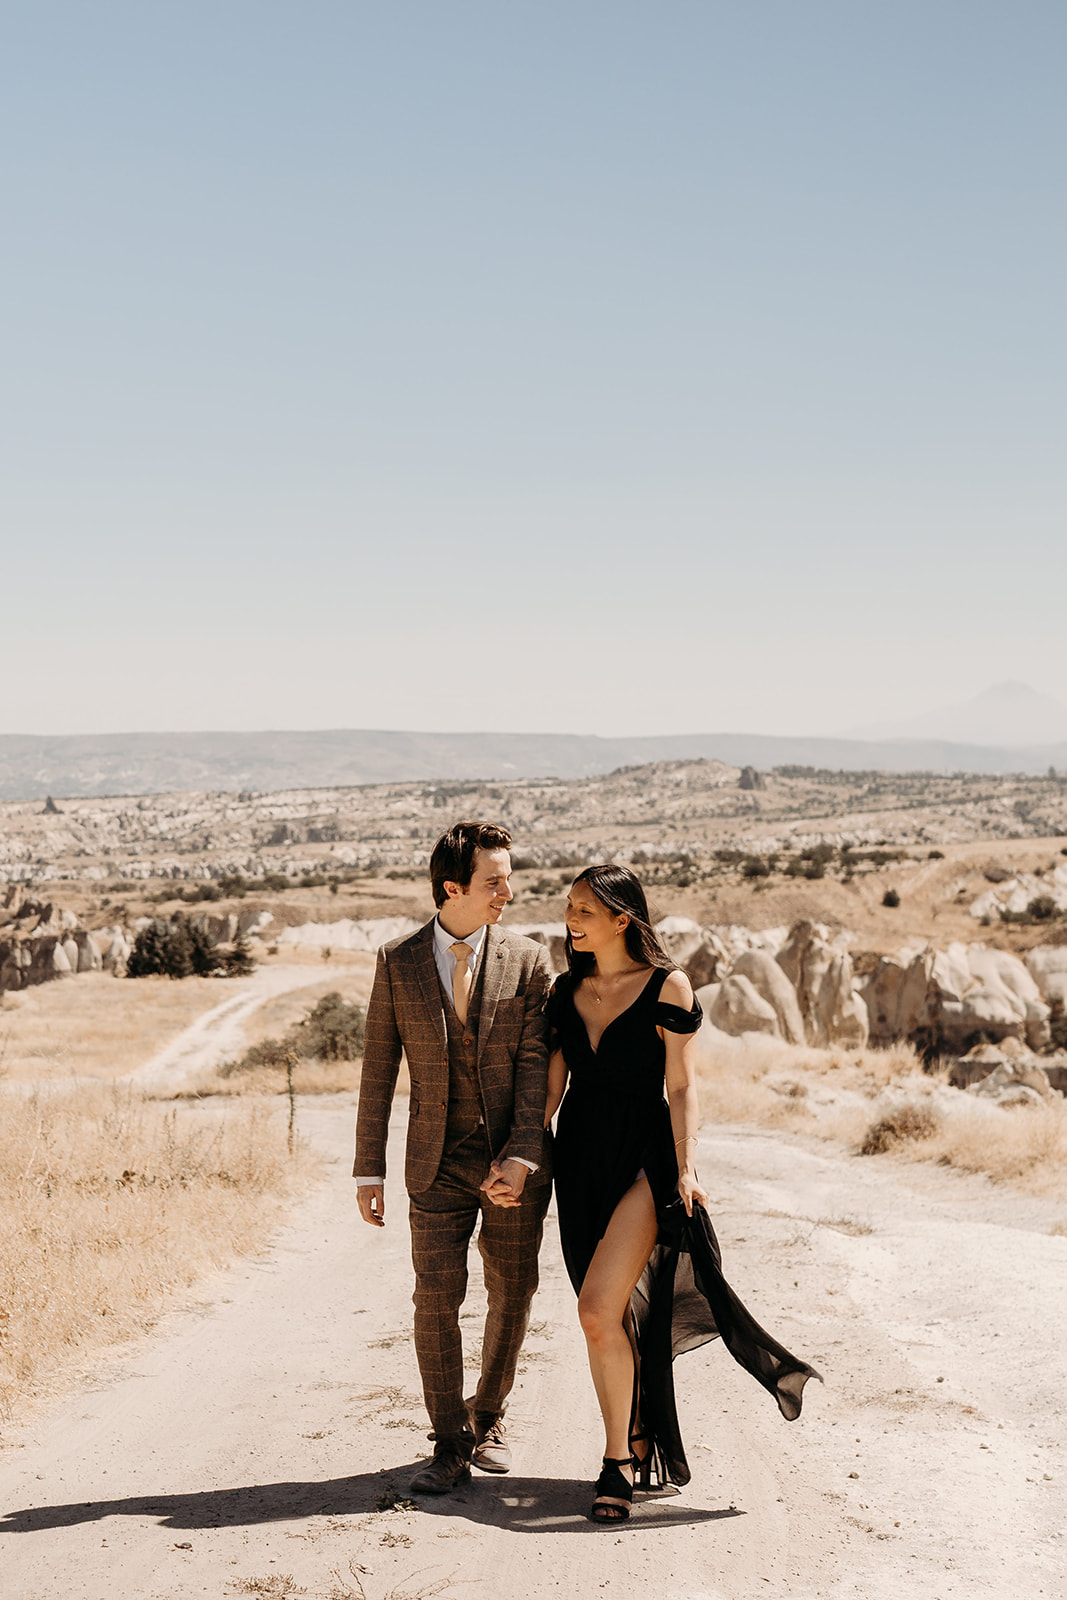 Cappadocia wedding - beautiful elopement photography - Turkish elopement photoshoot - desert wedding photographs